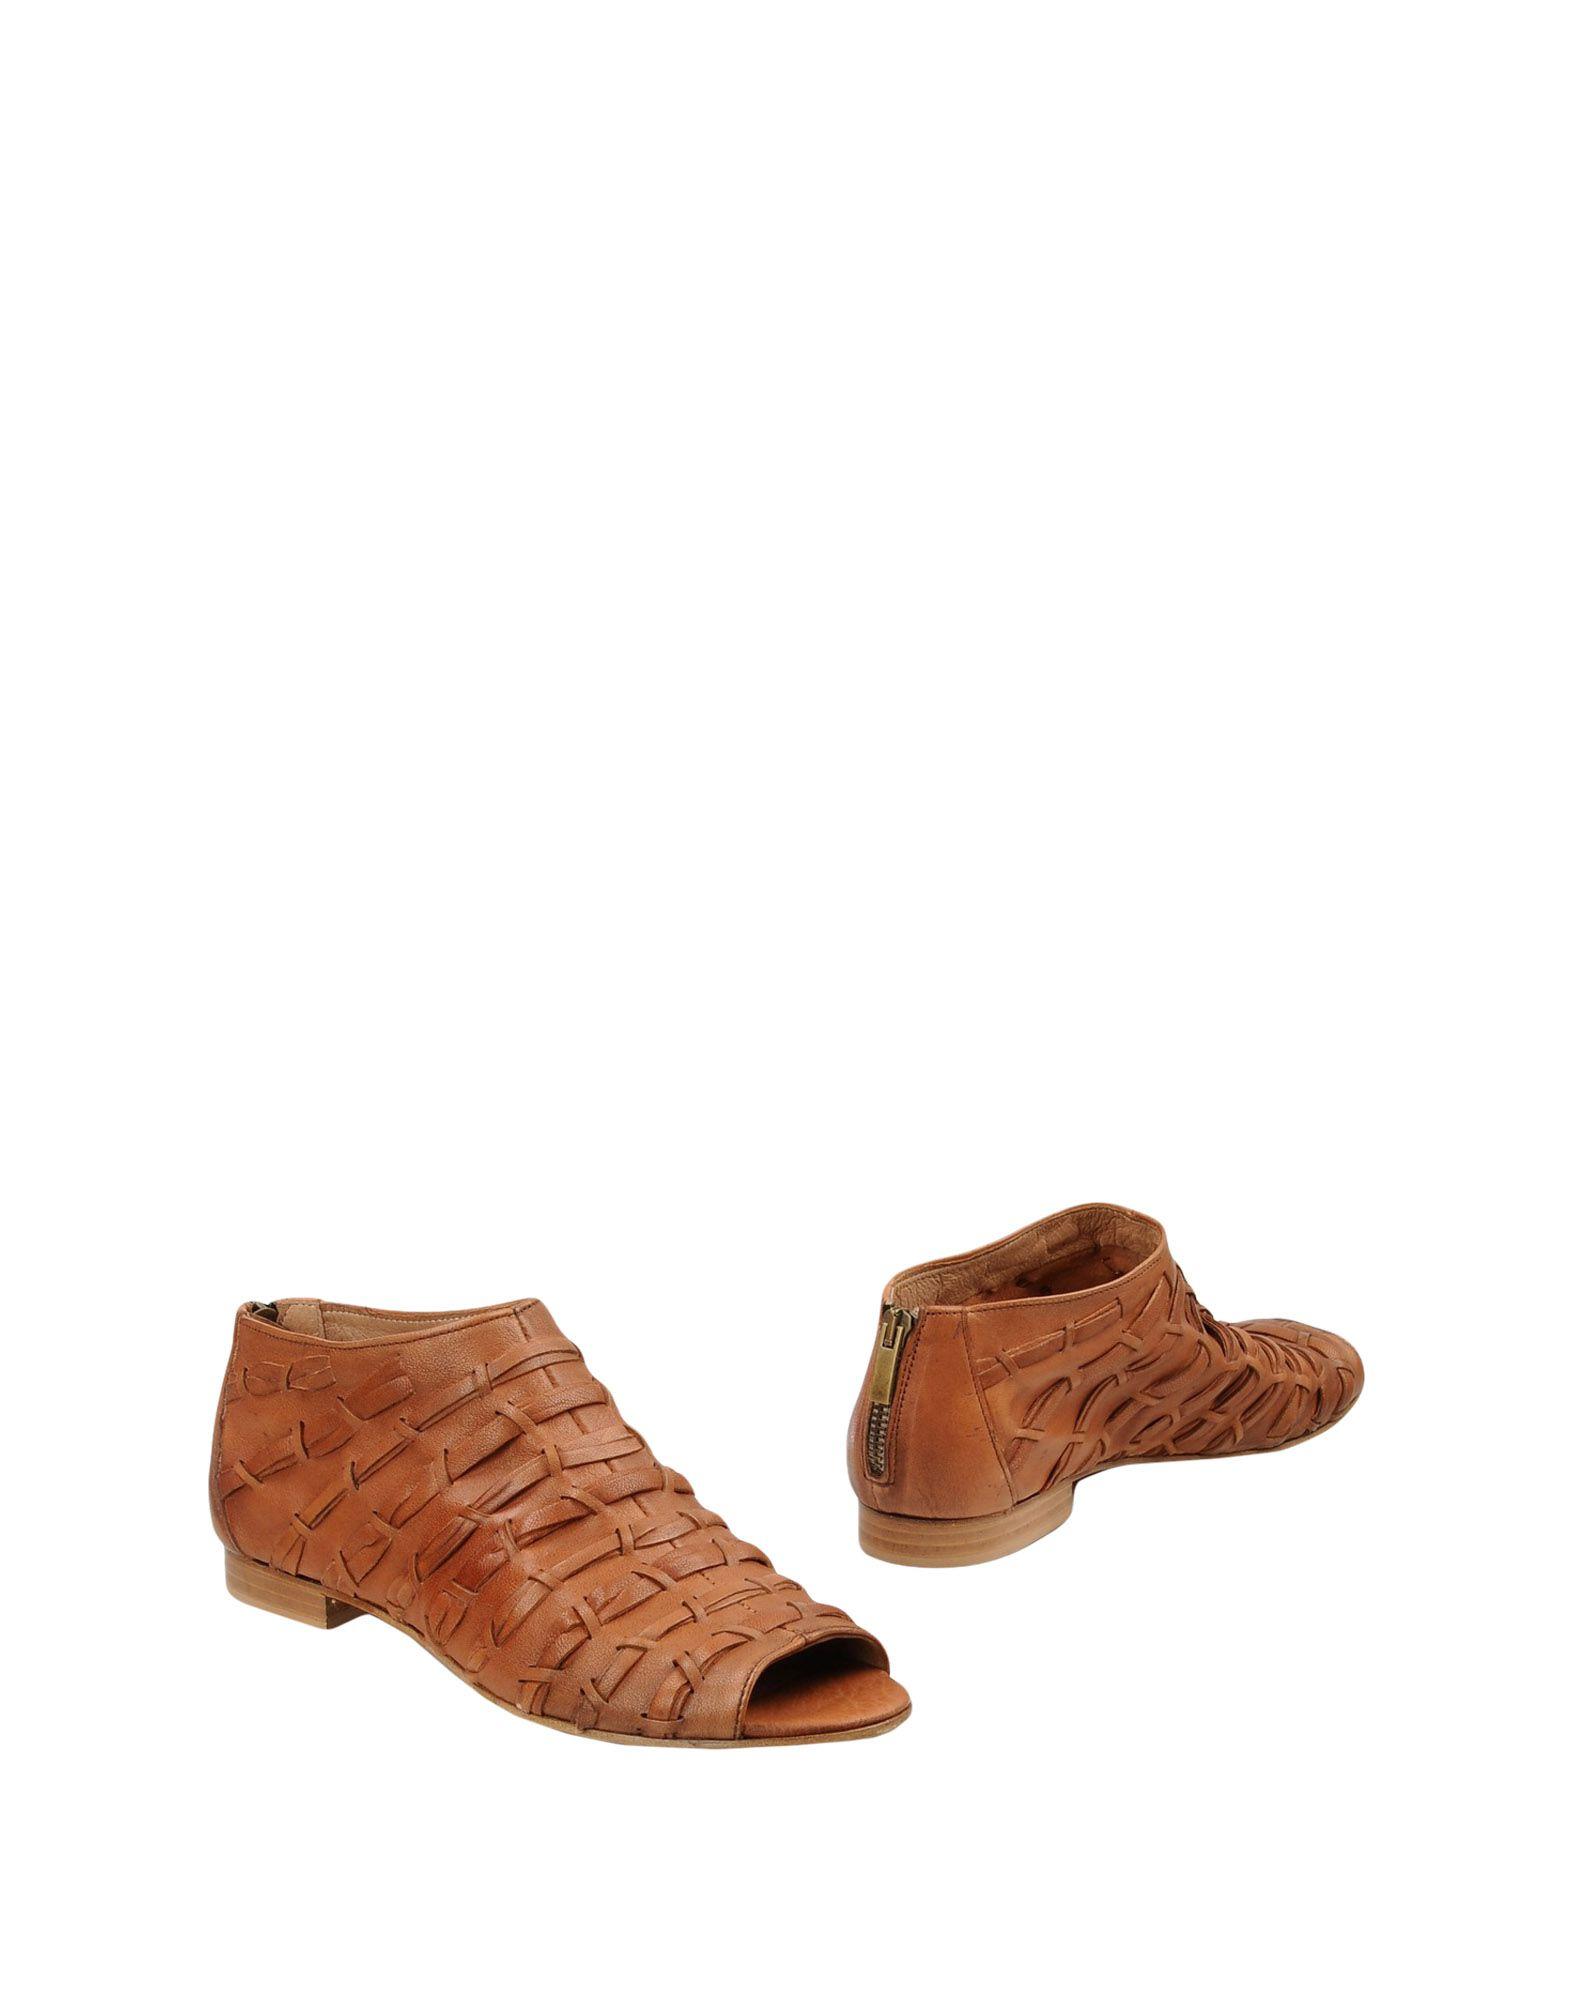 LEONARDO PRINCIPI Ботинки ботинки swims ботинки без каблука